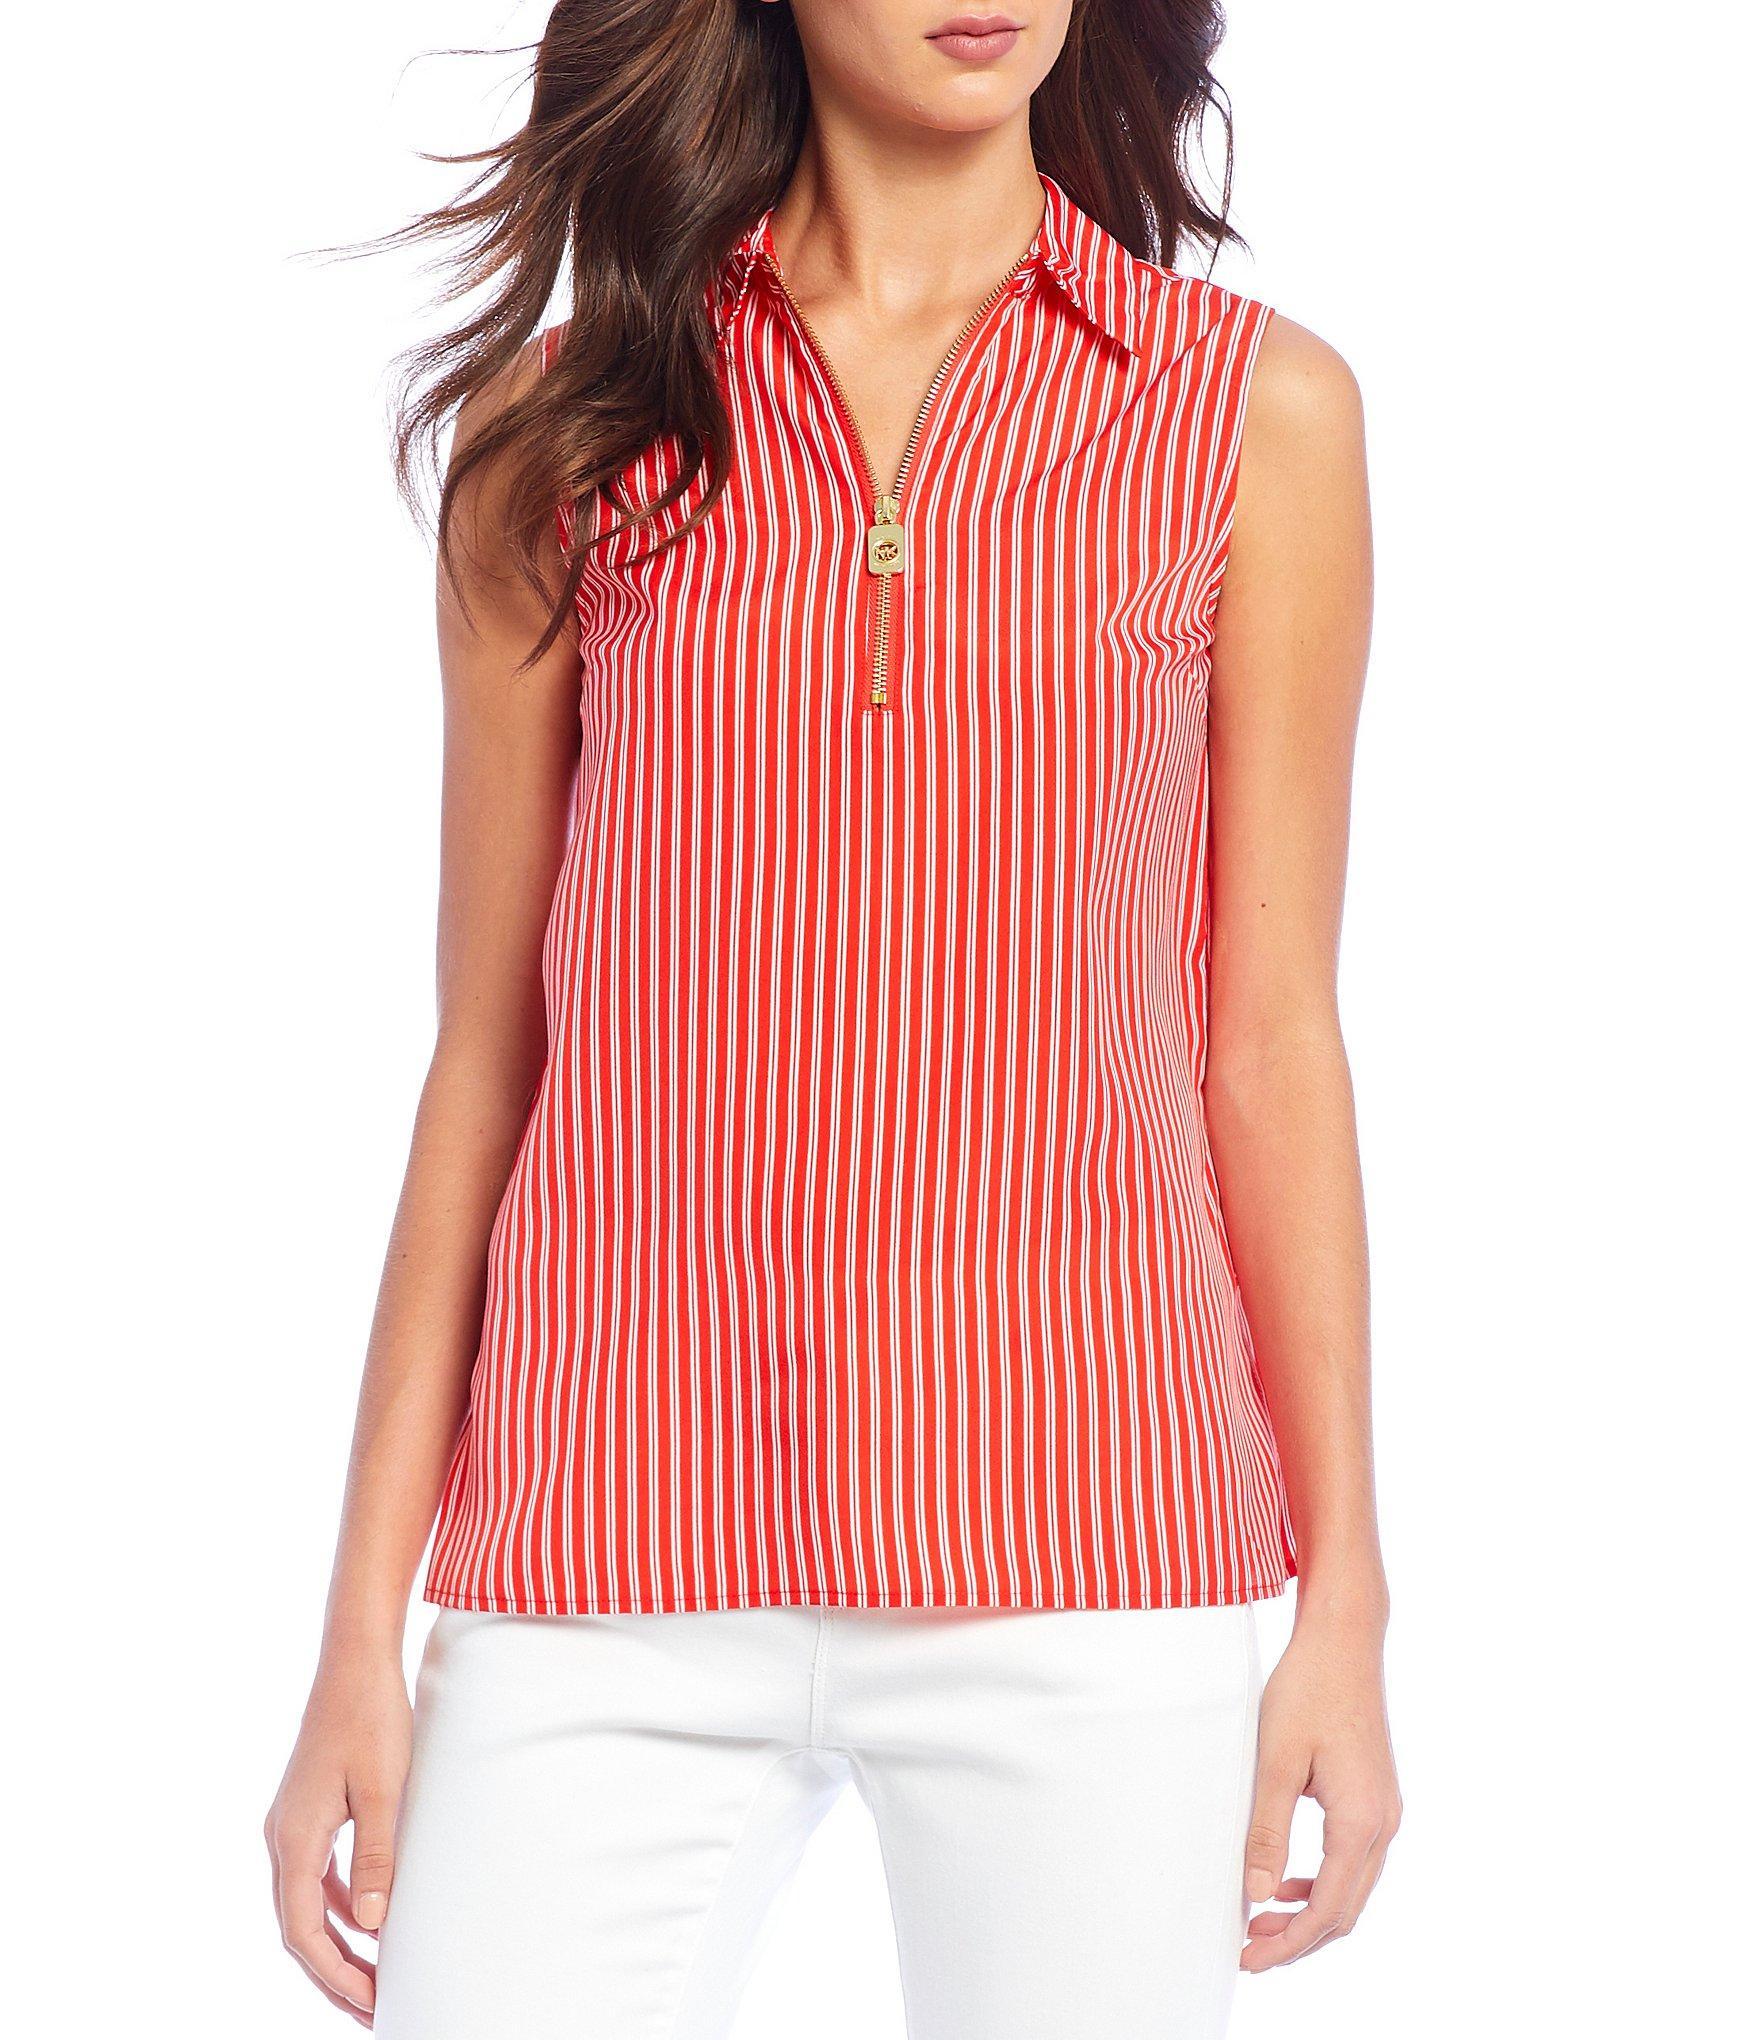 ba43b9b1849 MICHAEL Michael Kors. Women s Red Mini Railroad Stripe Print Sleeveless ...